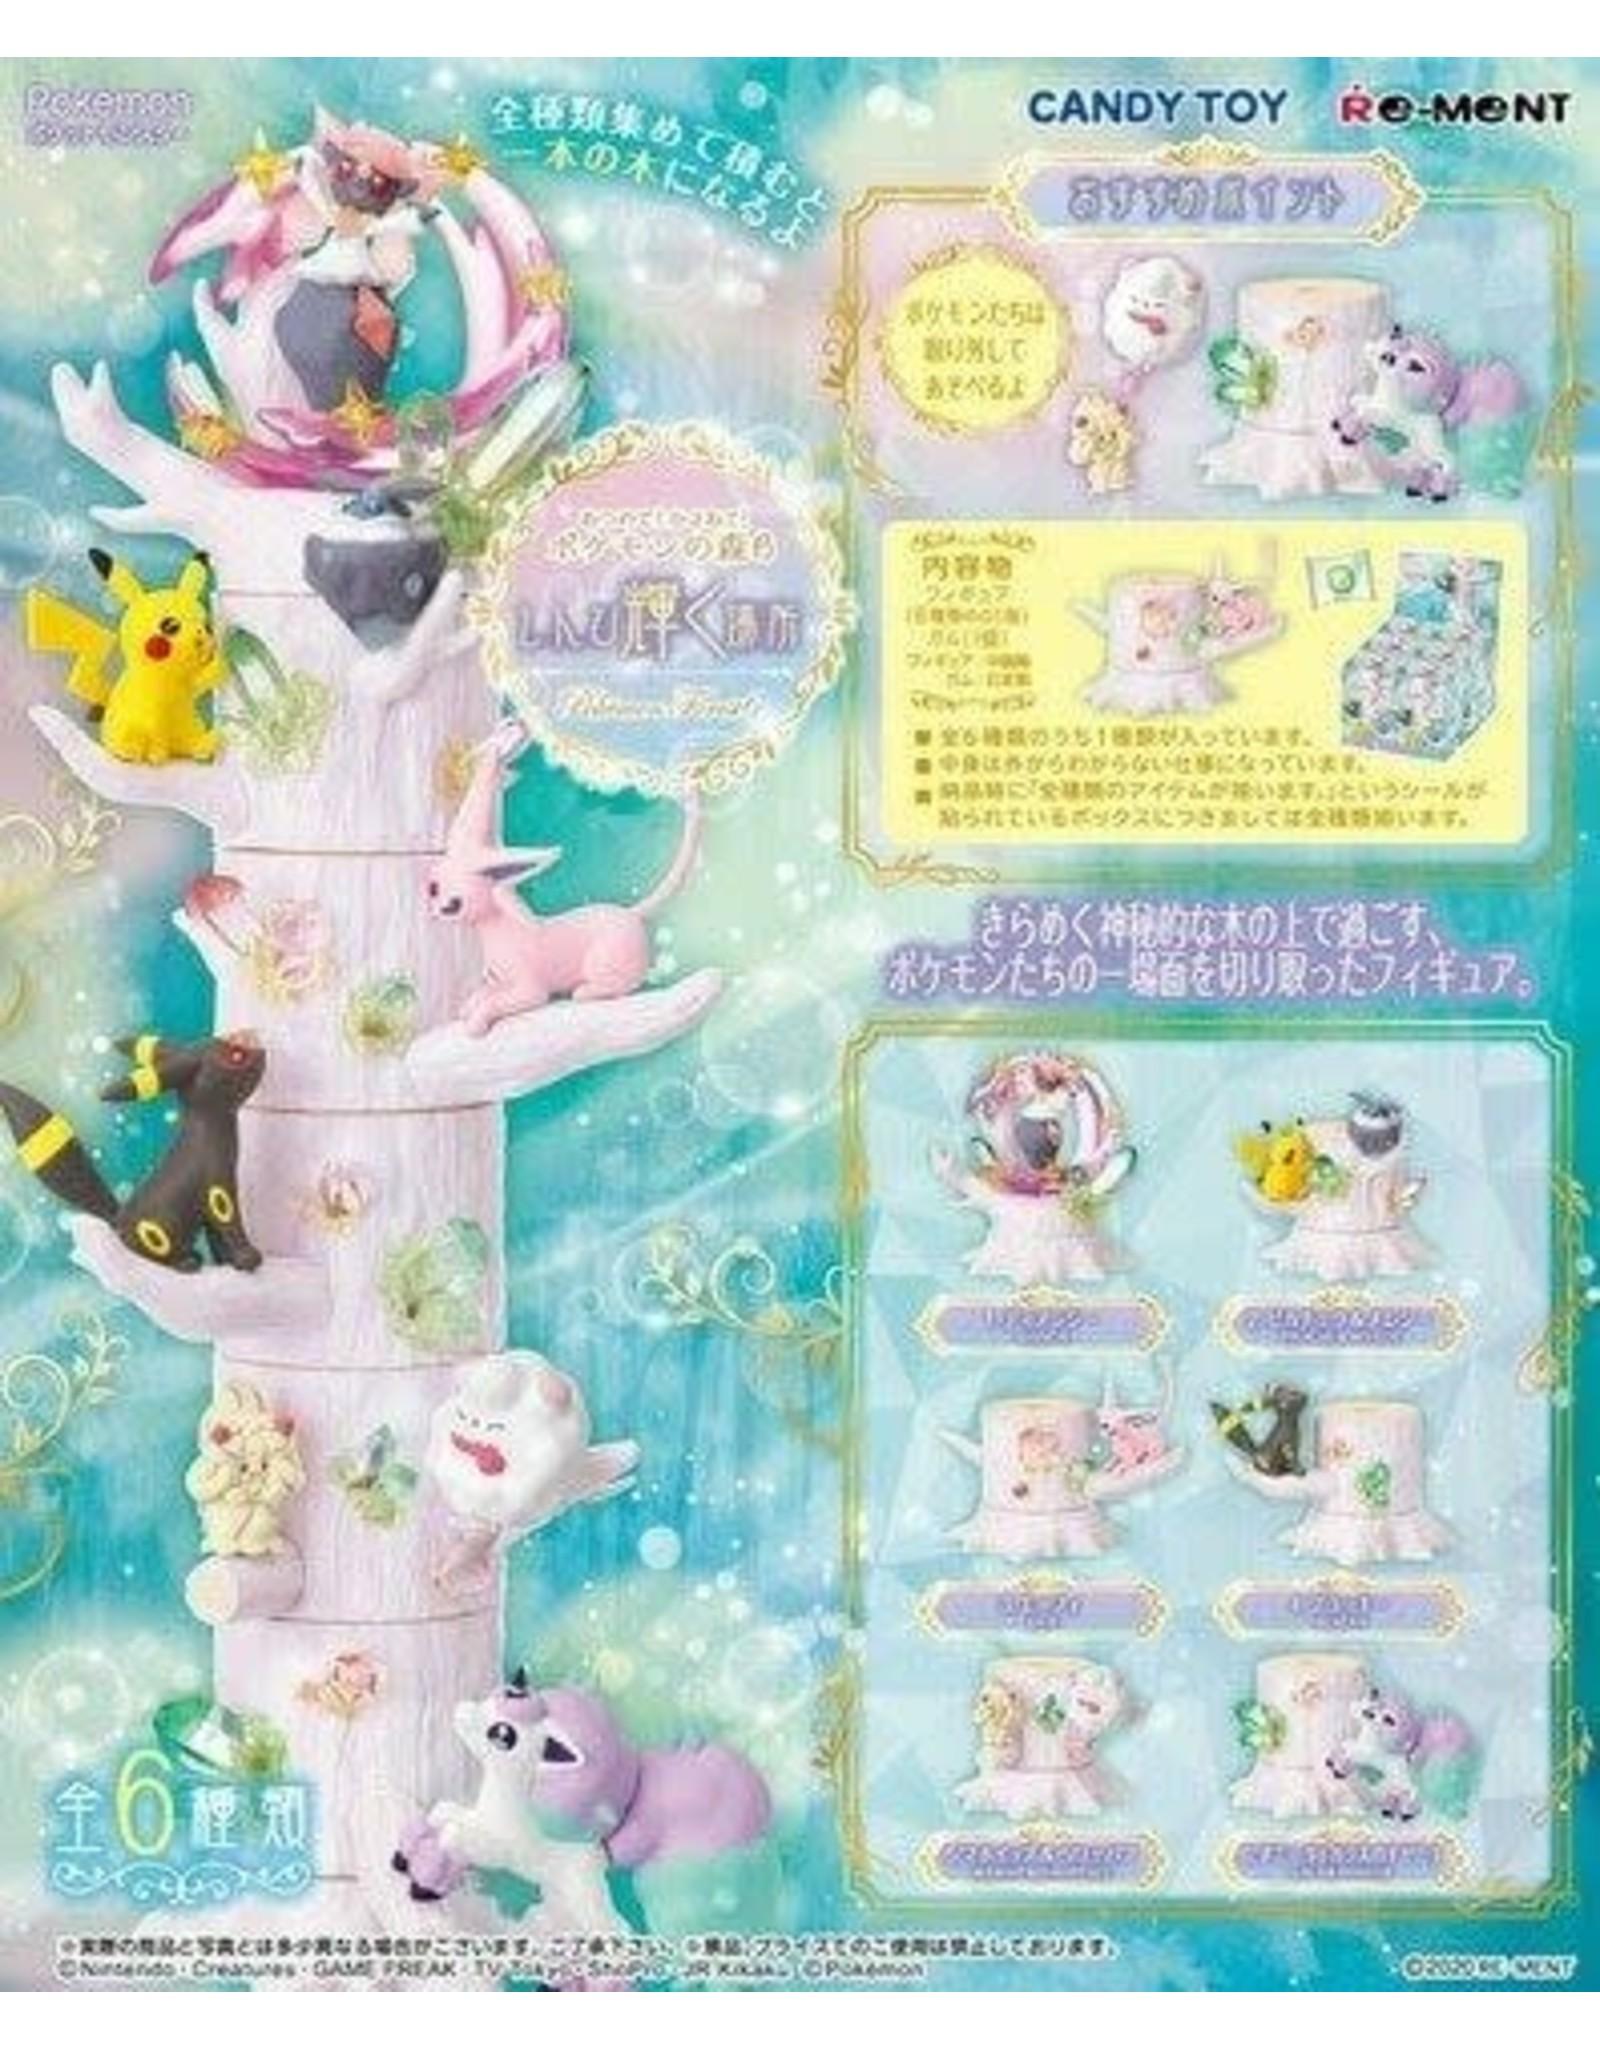 Re-Ment - Pokémon - Pokémon Forest 6 - 1 willekeurig item